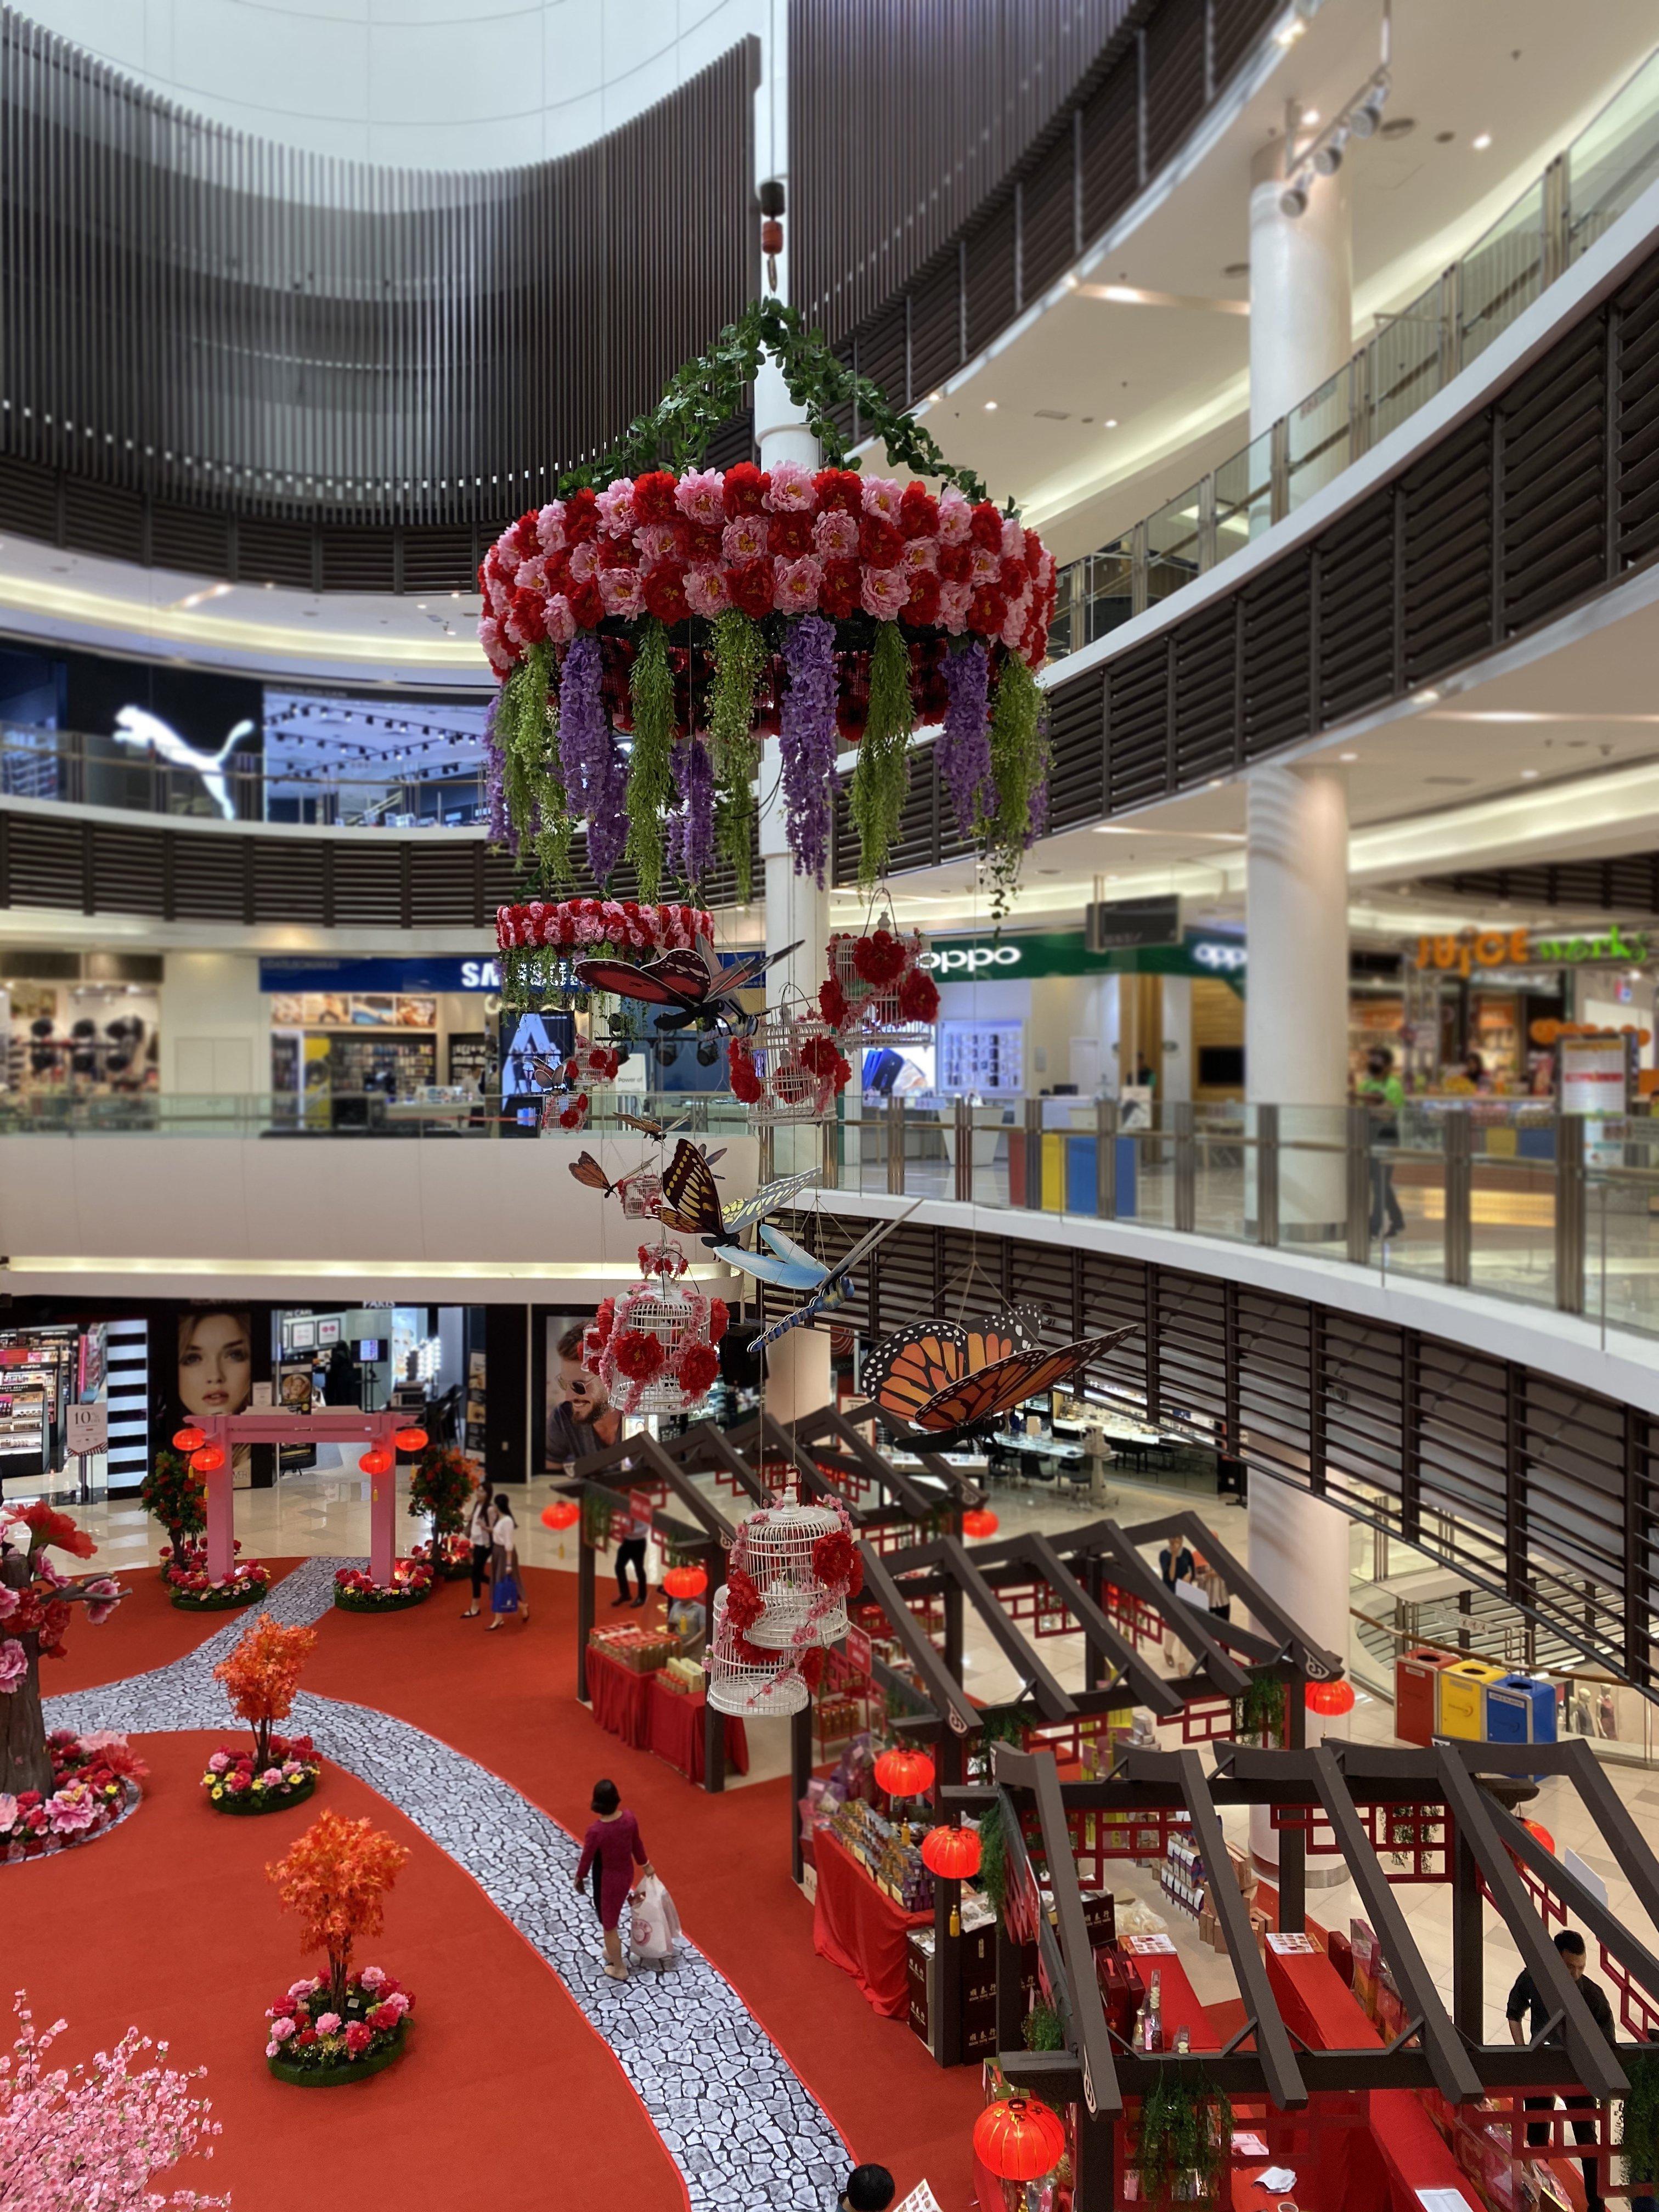 Image from Paradigm Mall Petaling Jaya/Facebook